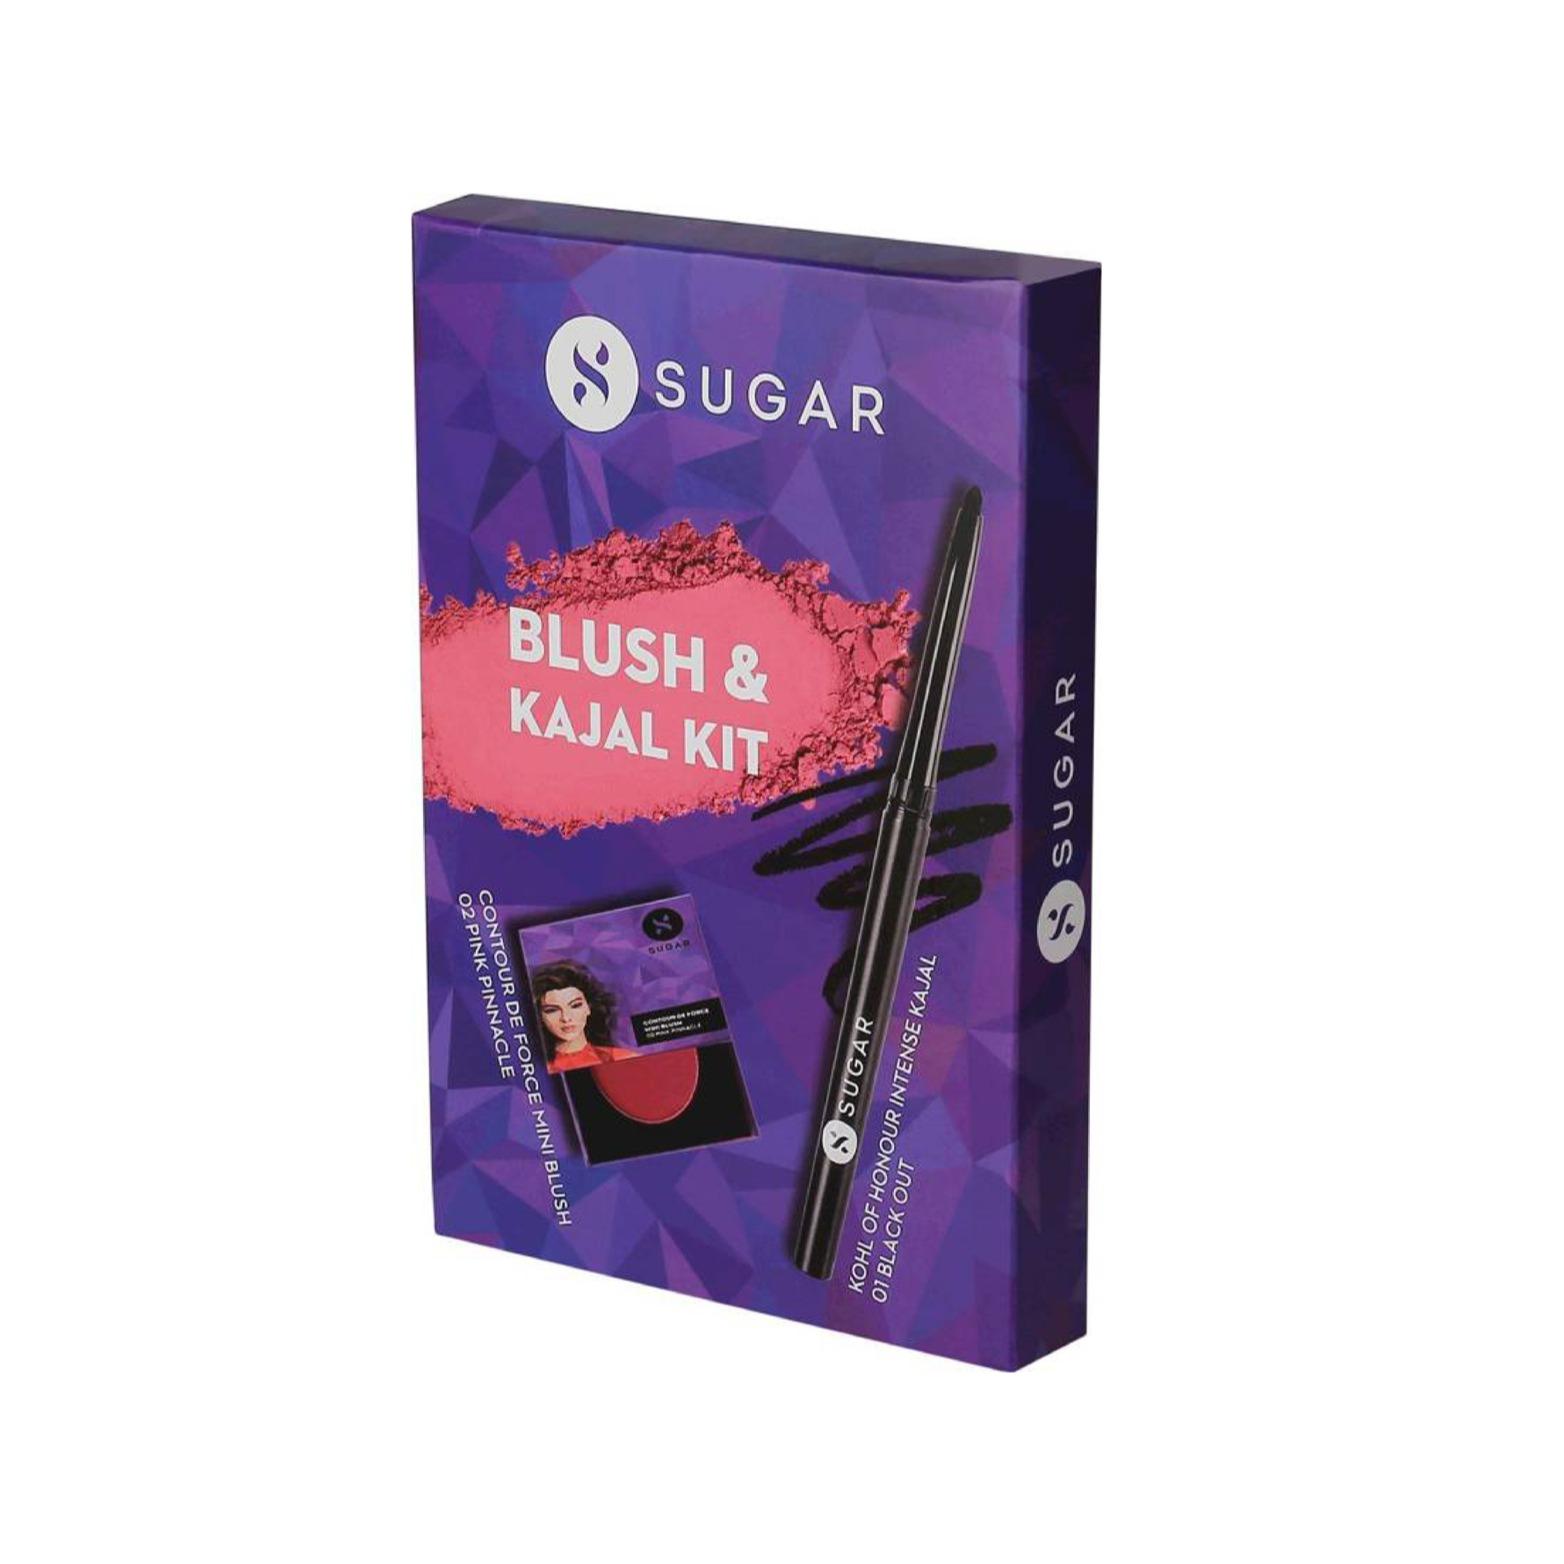 SUGAR Cosmetics Kohl Of Honour Kajal with Contour De Force Mini Blush - 02 Pink - Price in India, Buy SUGAR Cosmetics Kohl Of Honour Kajal with Contour De Force Mini Blush - 02 Pink Online In India, Reviews, Ratings & Features | Flipkart.com